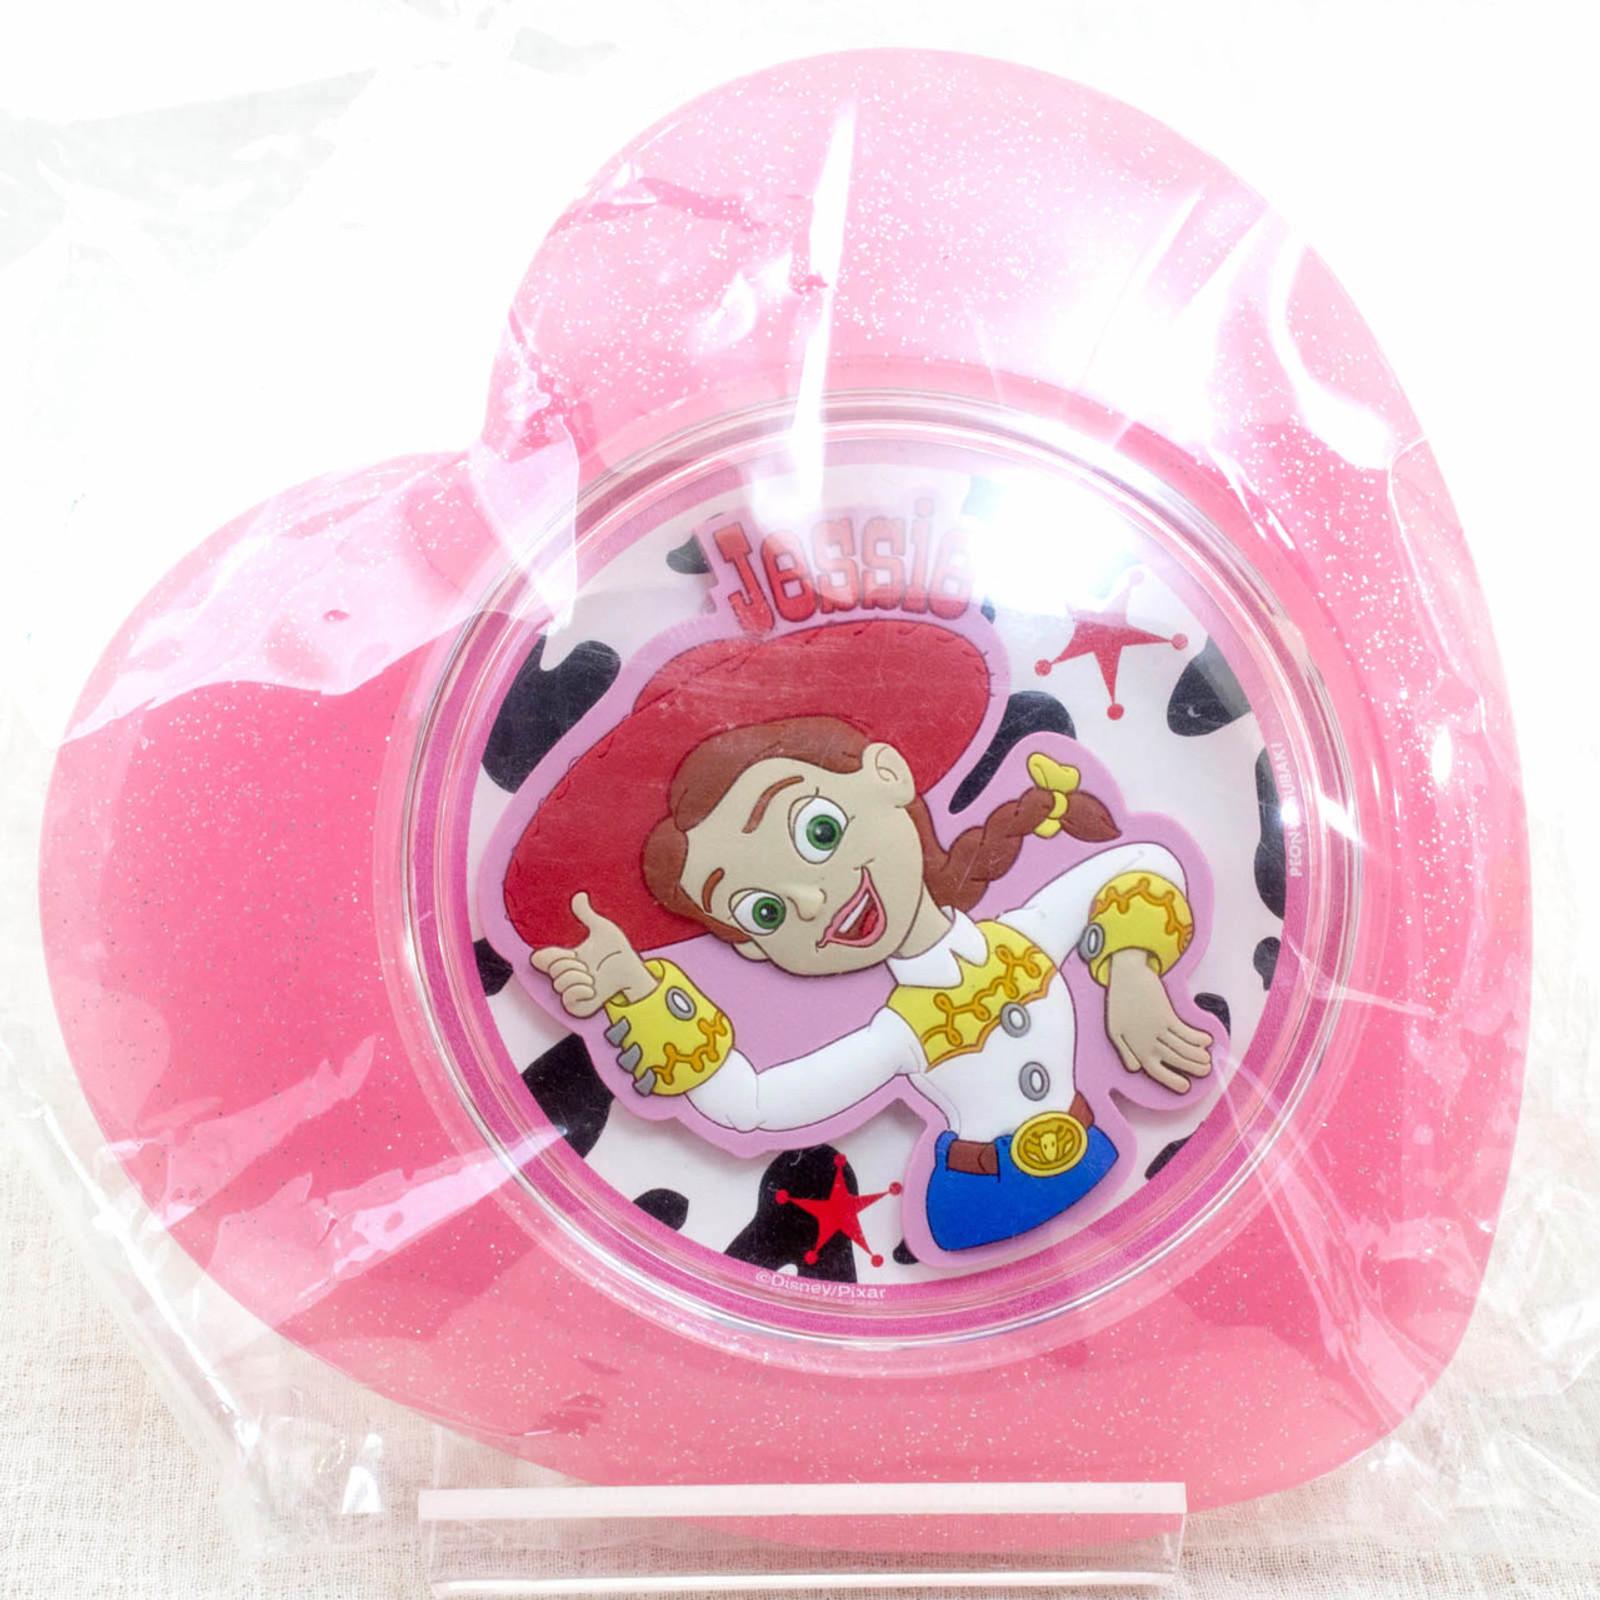 Disney Pixar Toy Story Capsule Mirror Jessie Peony Tsubaki JAPAN